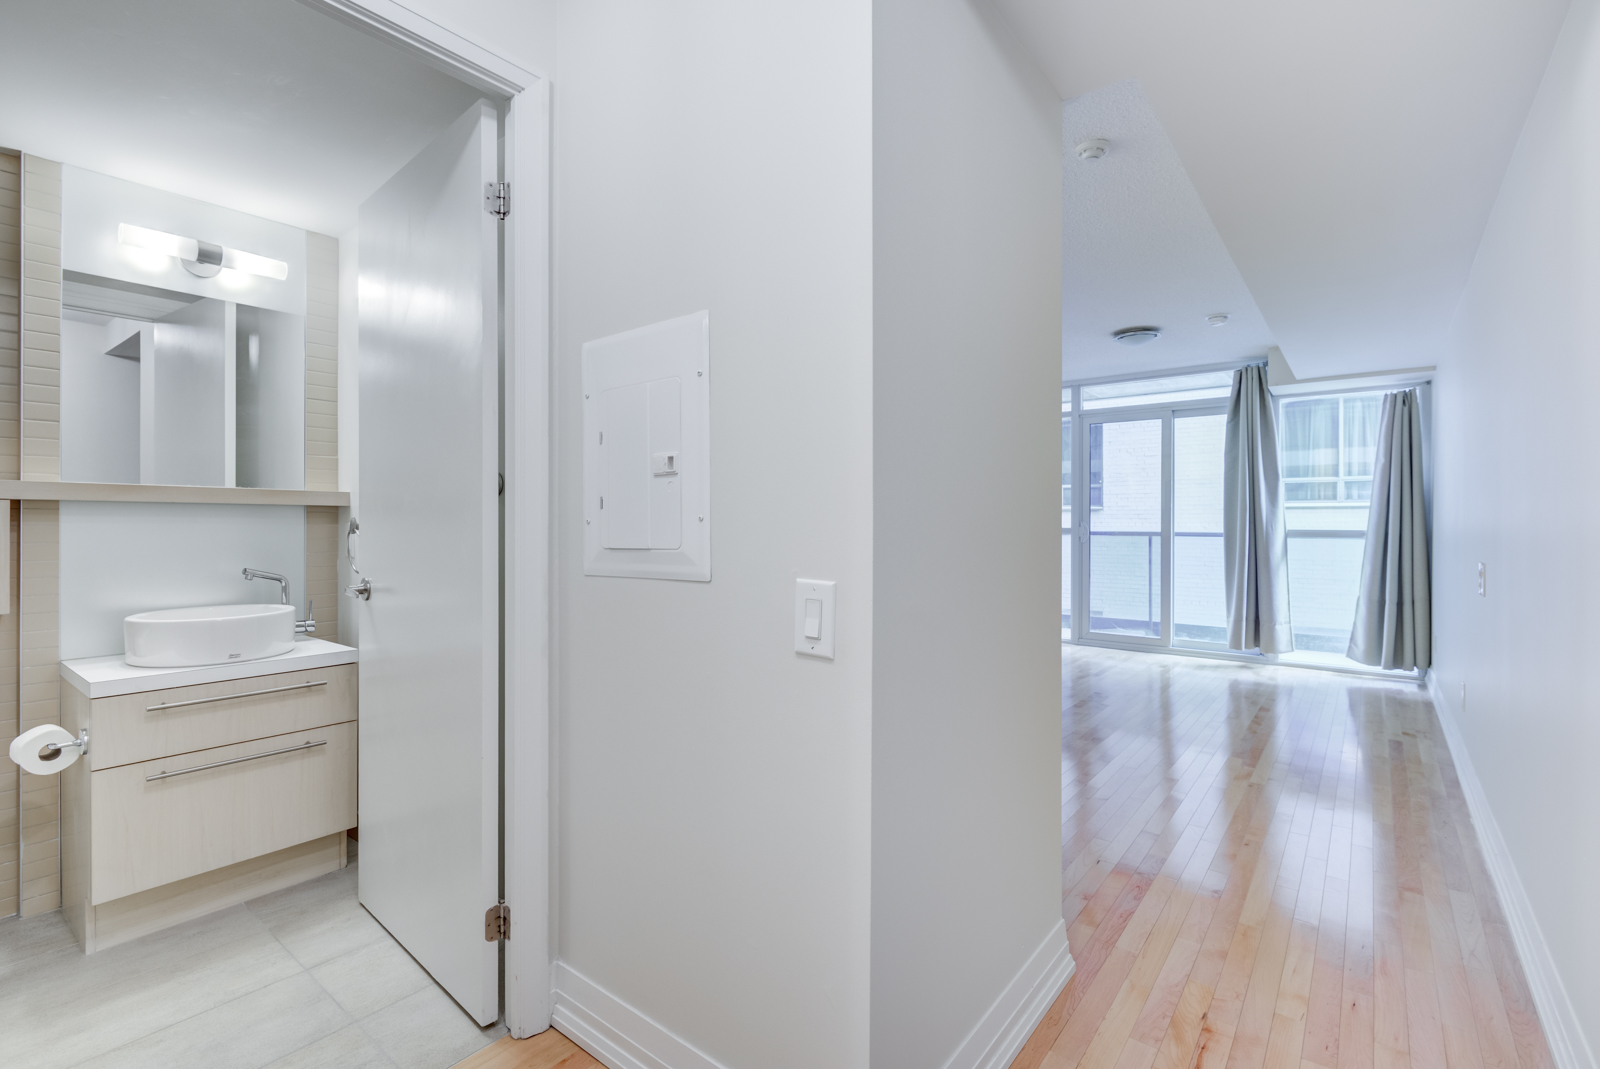 25 Carlton St Unit 401 interior showing bathroom and balcony